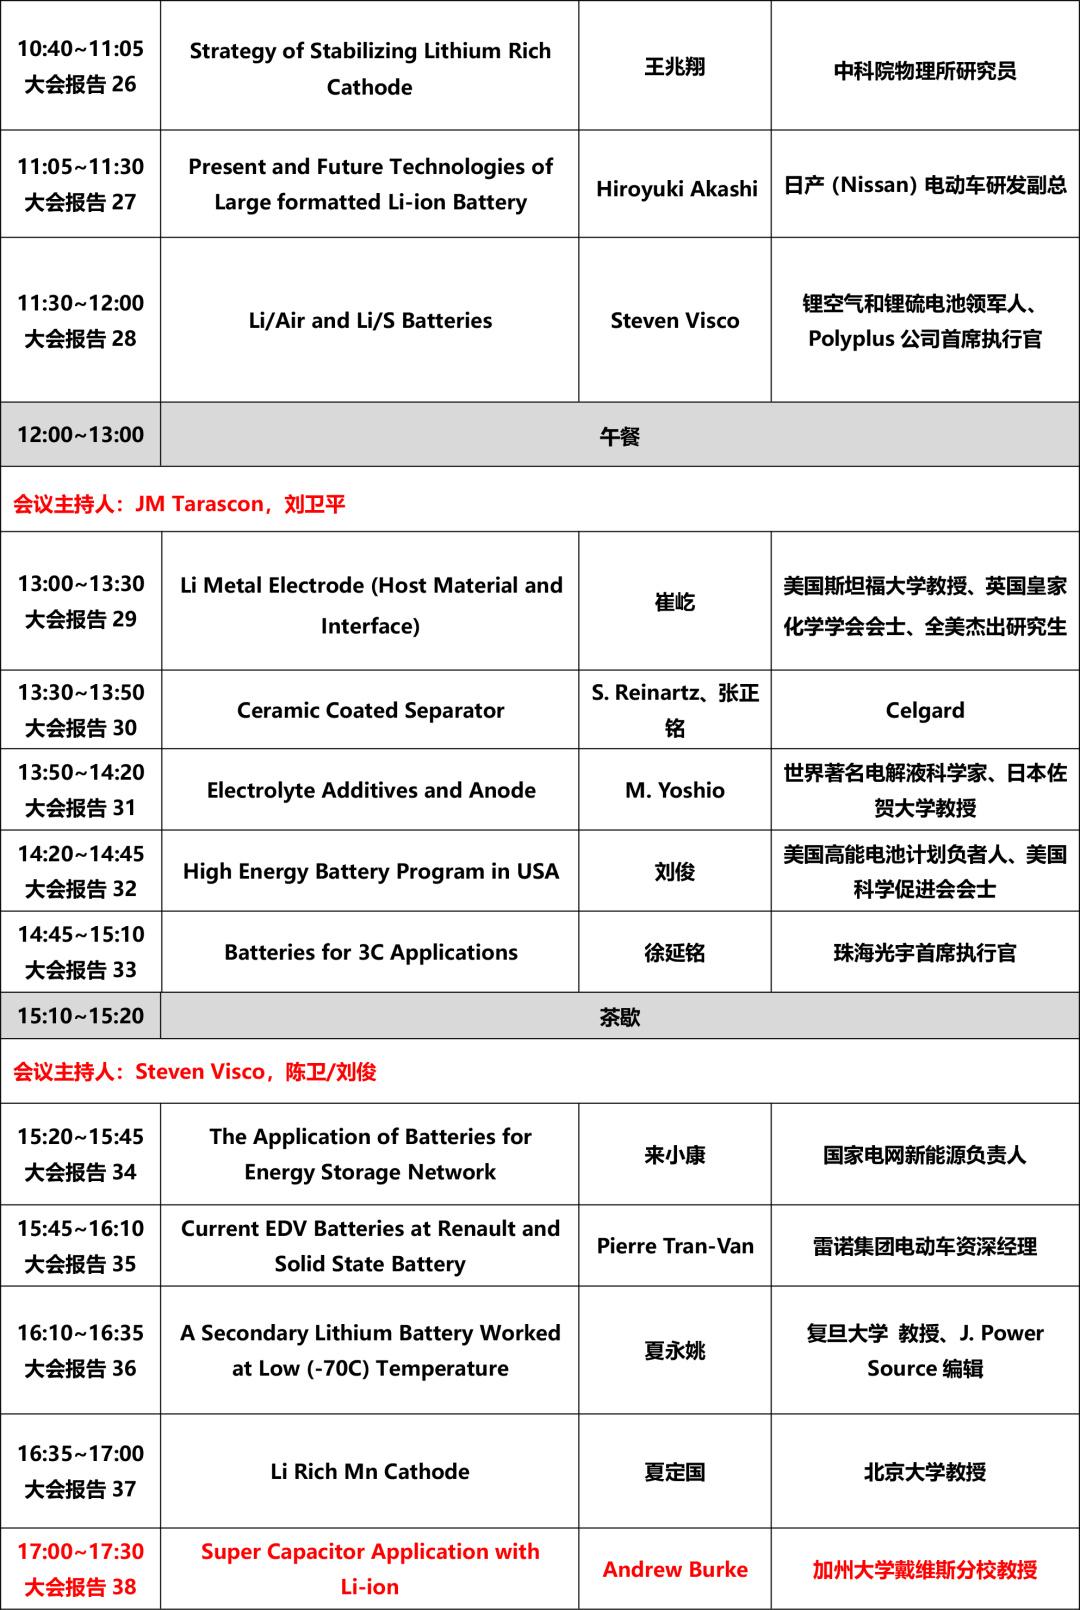 LBIS2019 第四届全球锂电科学技术研讨会 暨第九届华南锂电(国际)高层论坛